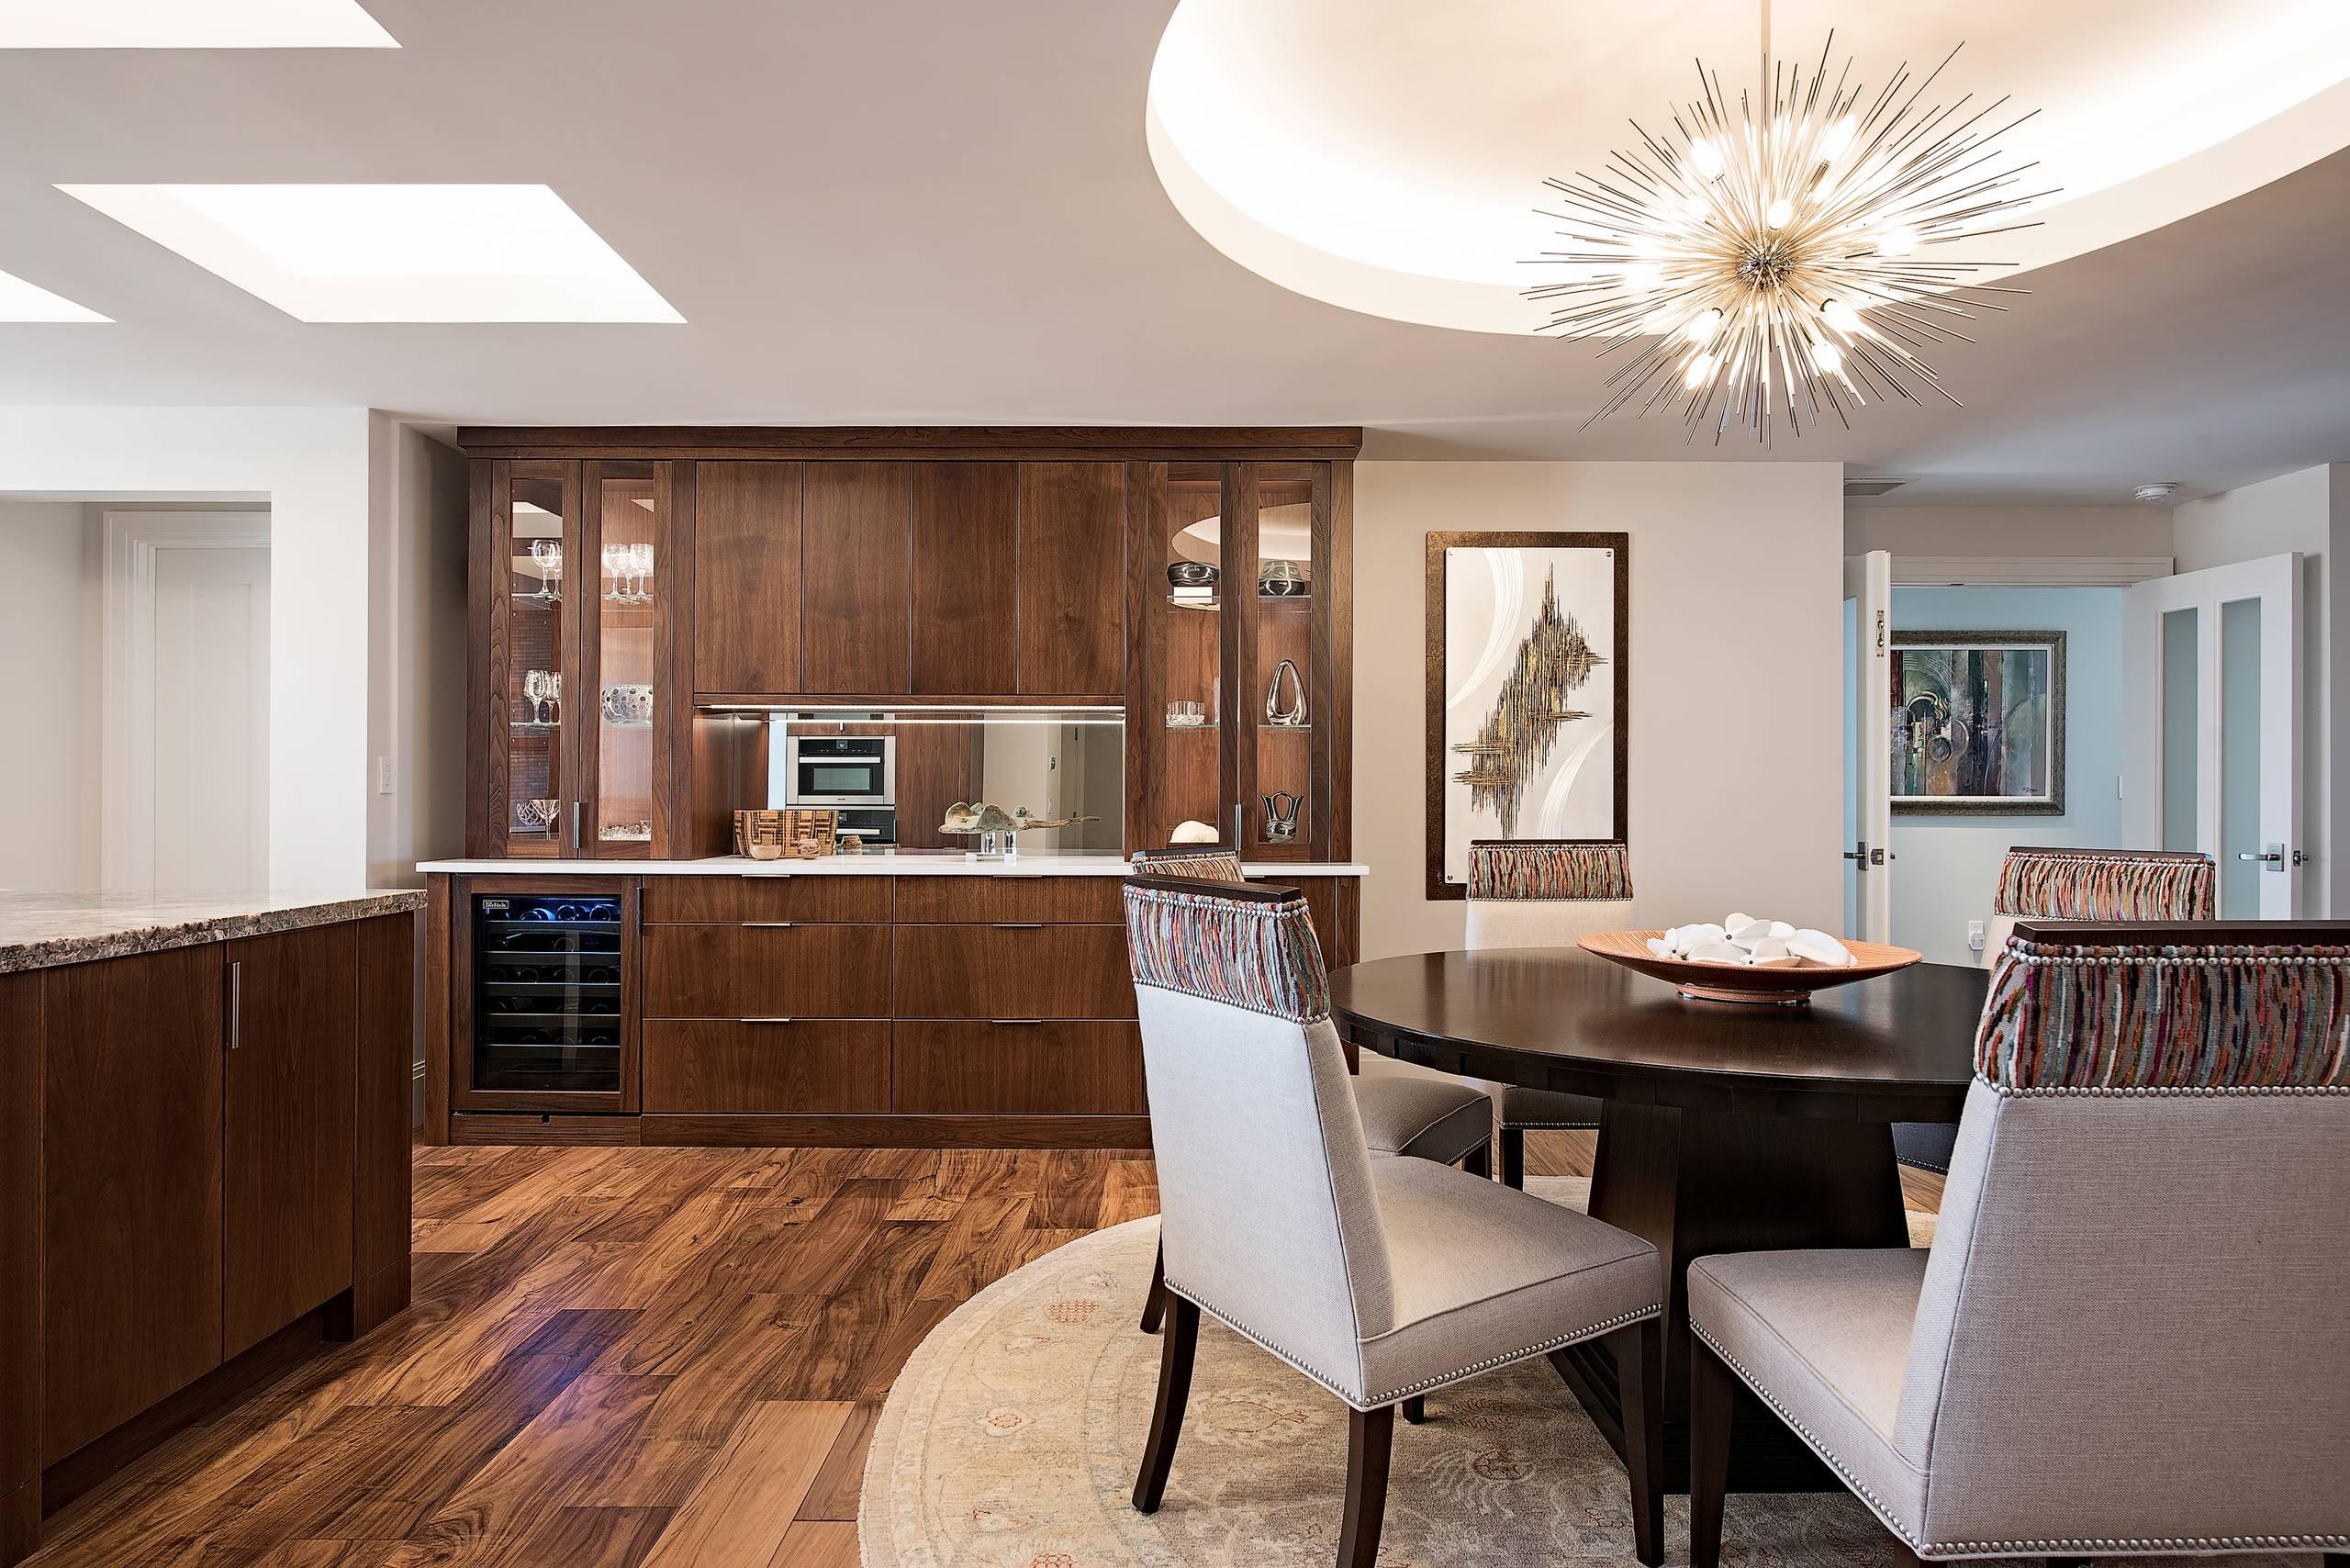 Certified Luxury Builders-41West-Naples-Pelican Bay-St Raphael-High-rise Condo